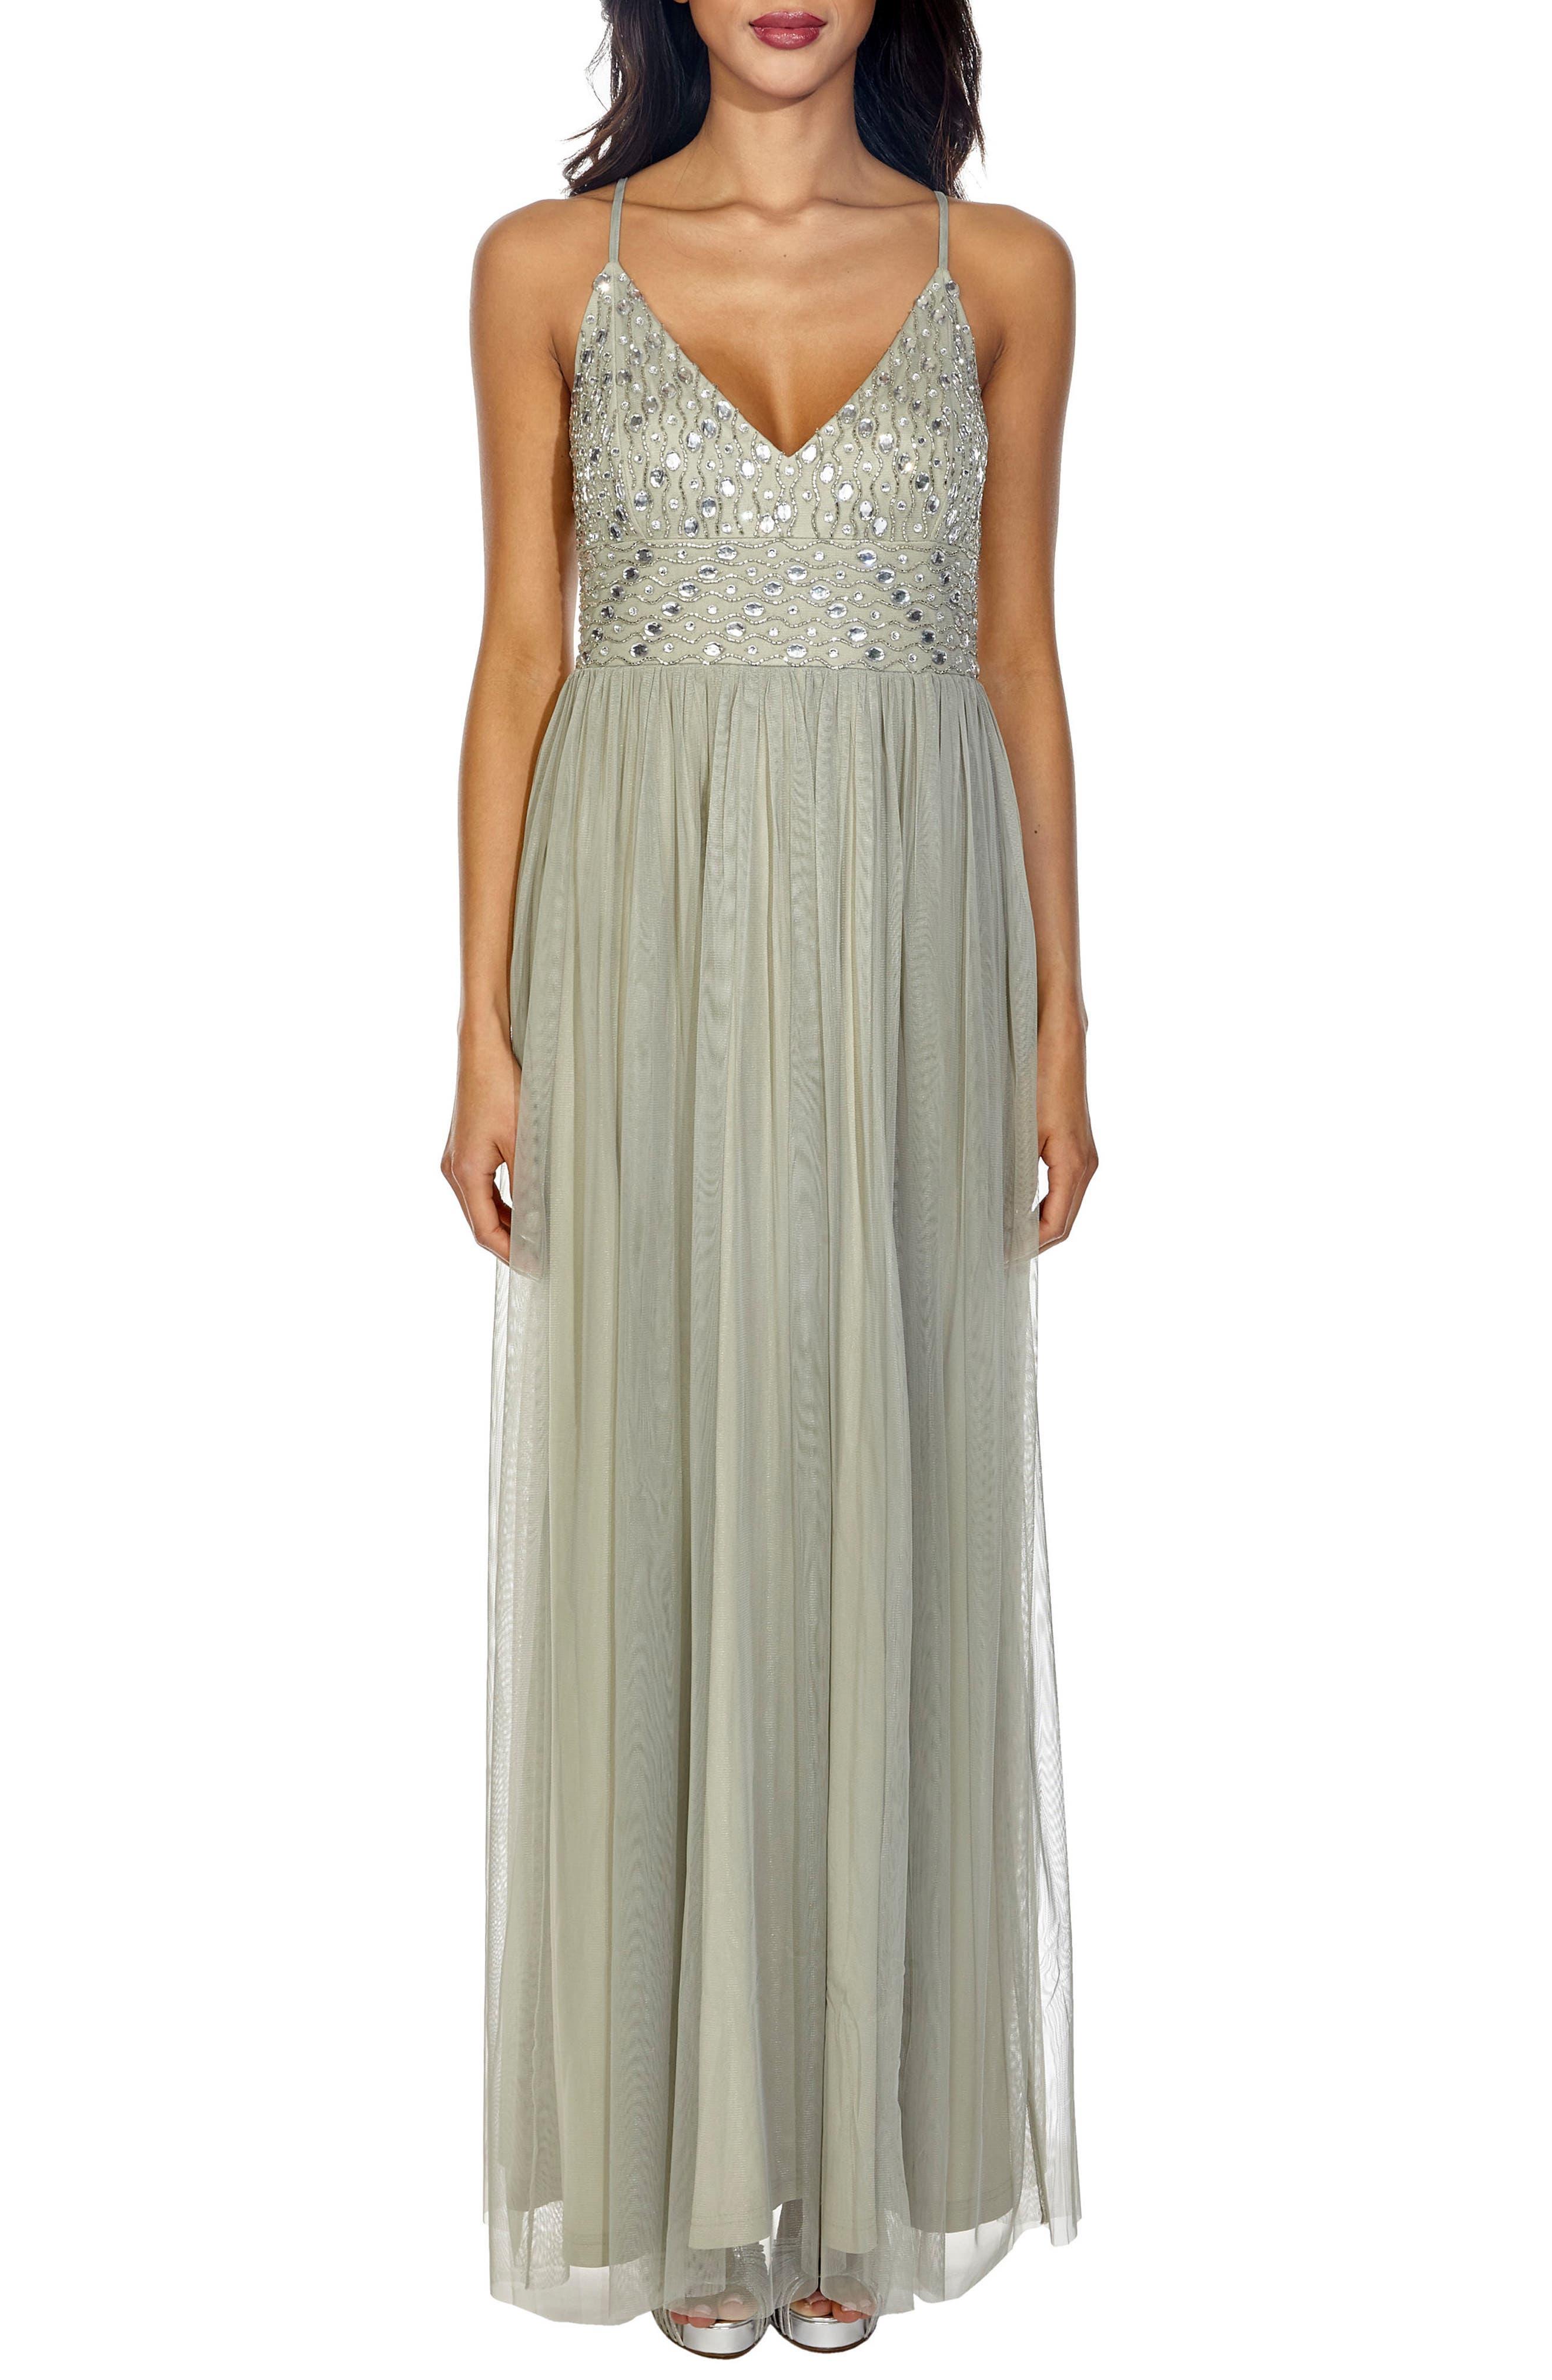 Maeve Beaded Maxi Dress, Main, color, 330